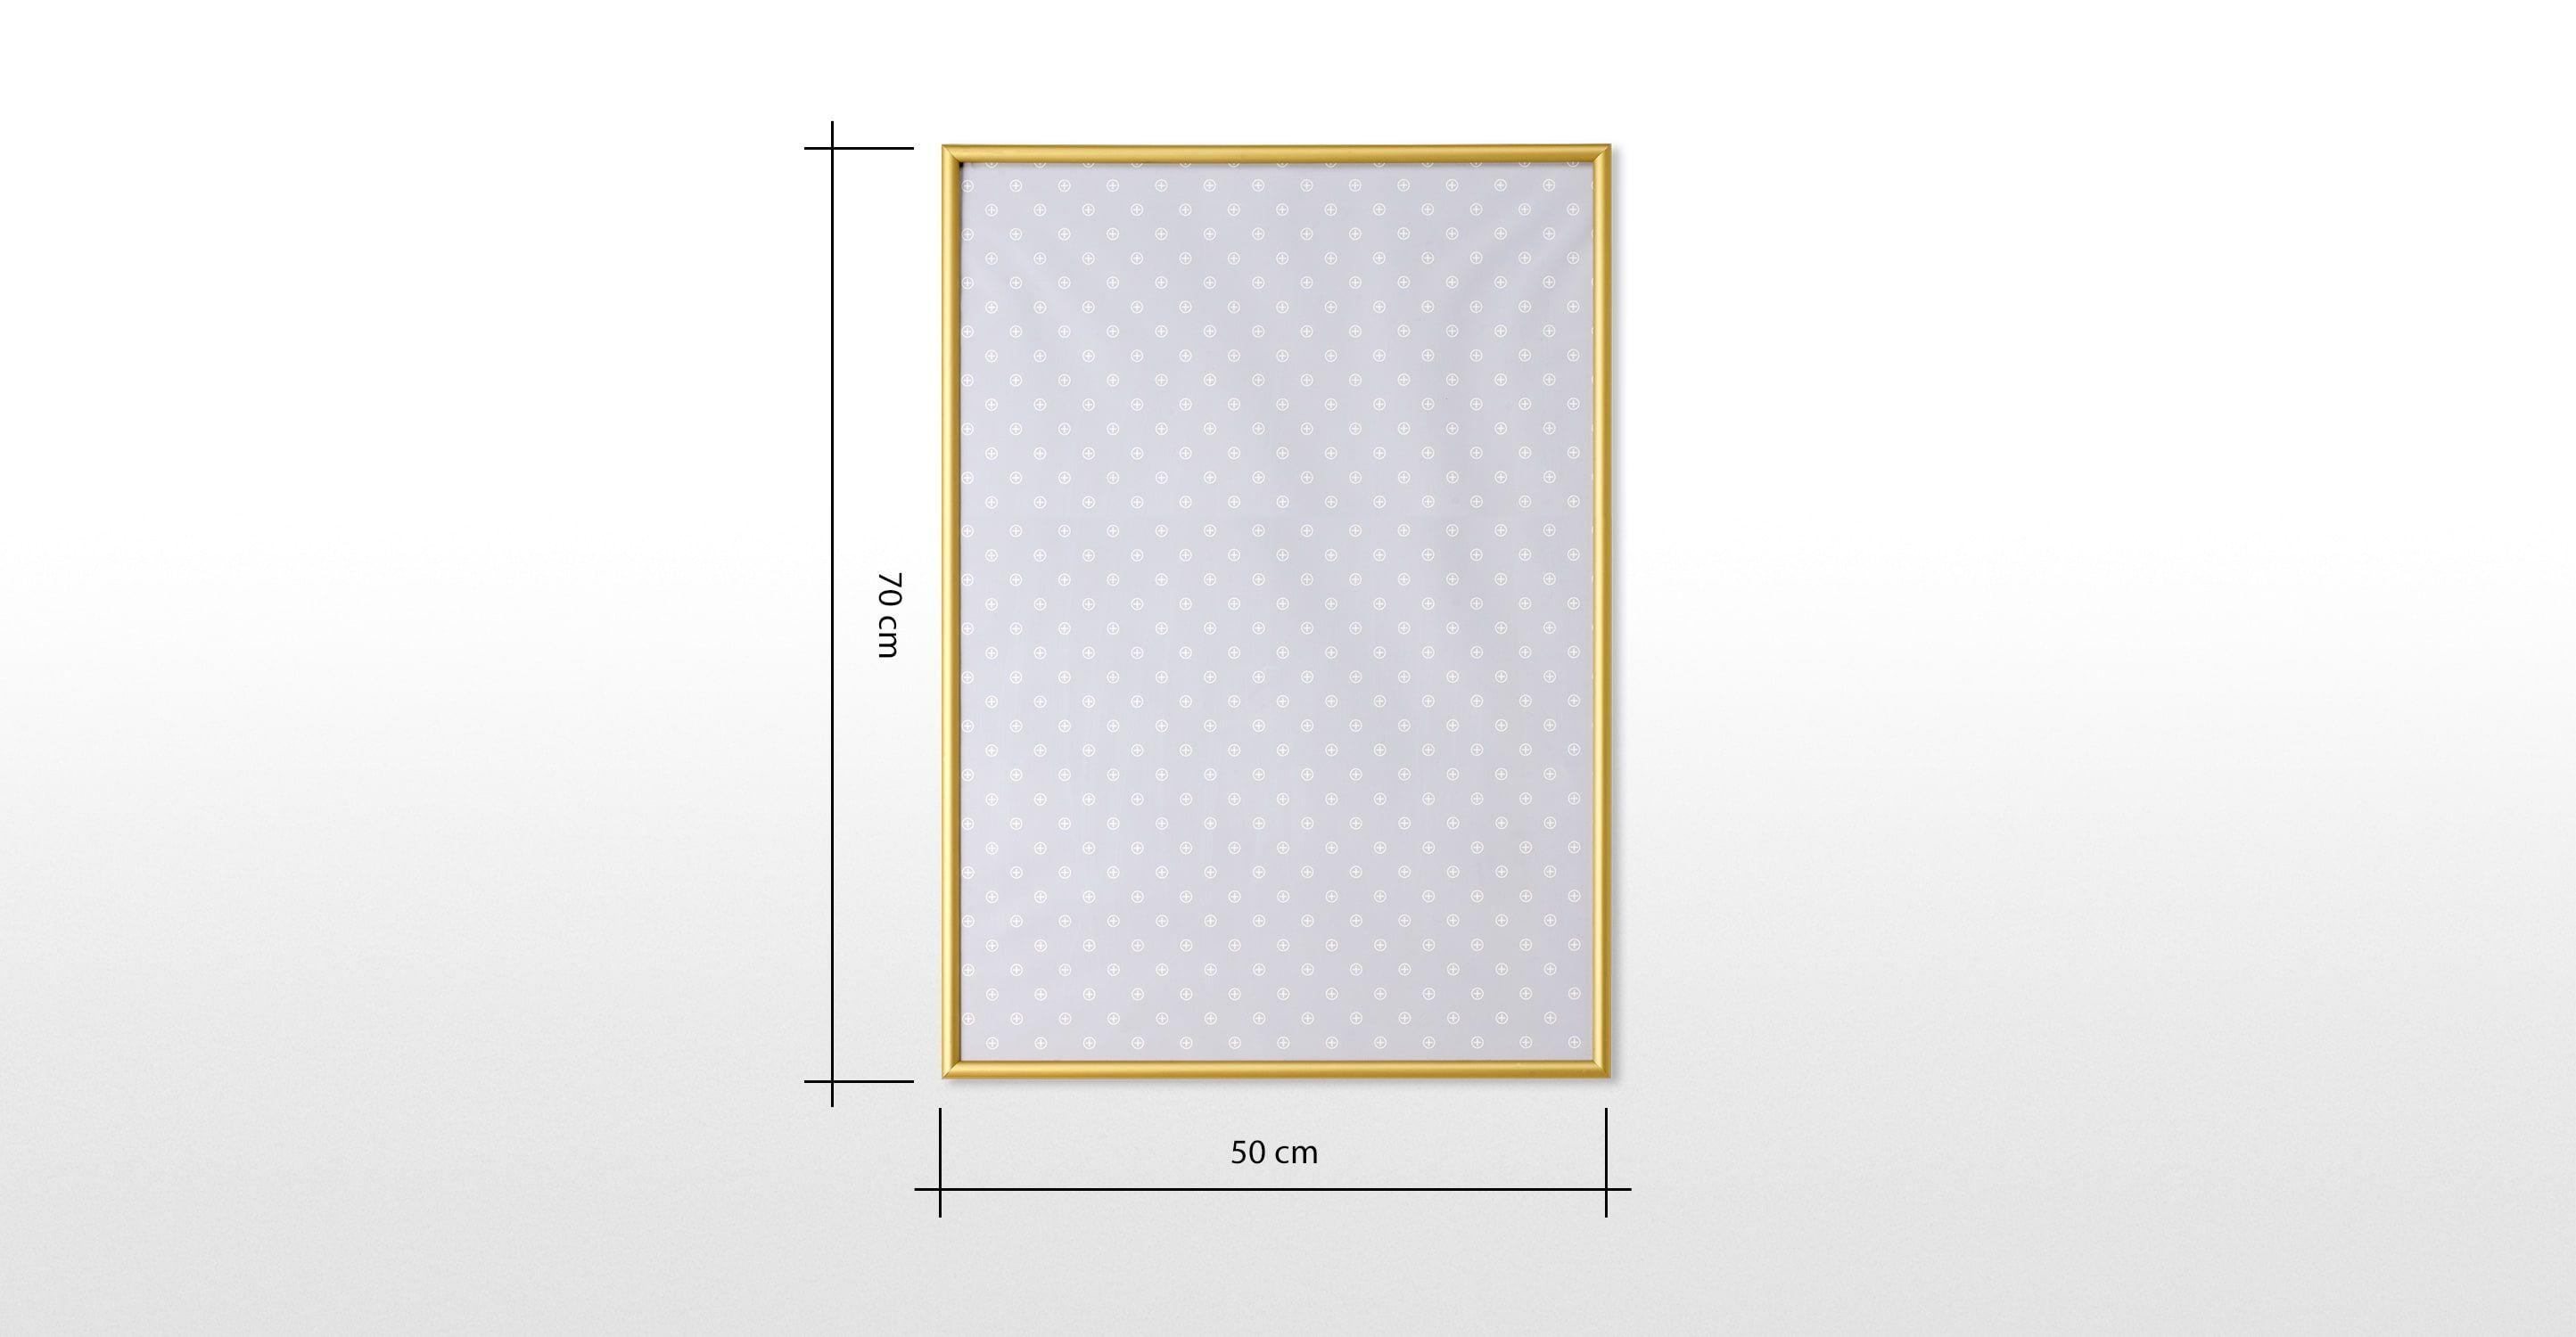 Ziemlich 50 X 70cm Rahmen Fotos - Deko Ideen Mit Bilderrahmen ...